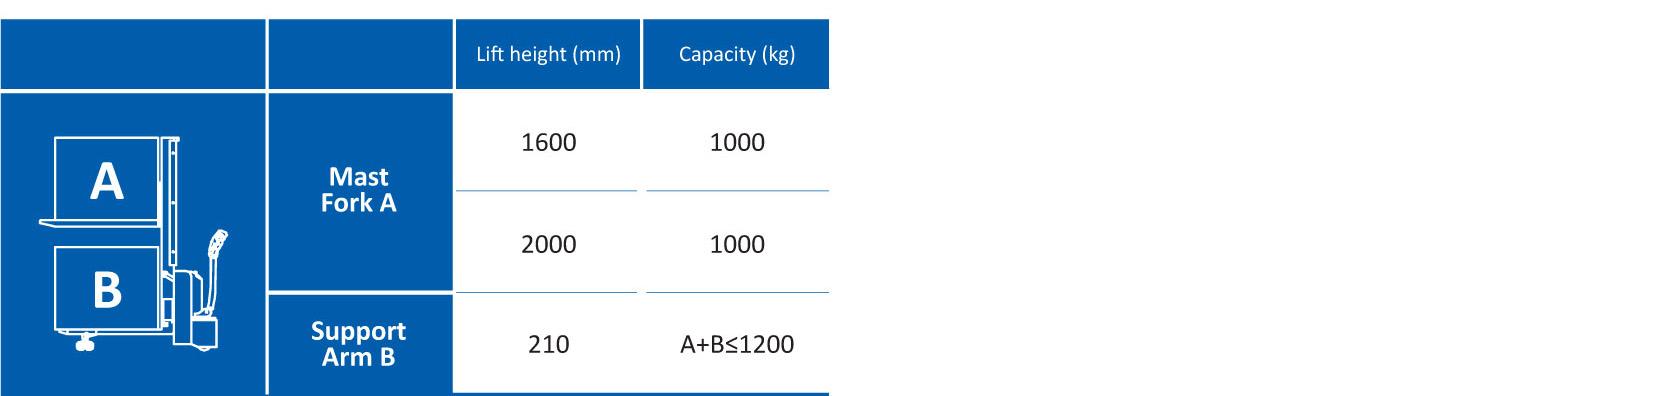 chart.jpg (115 KB)